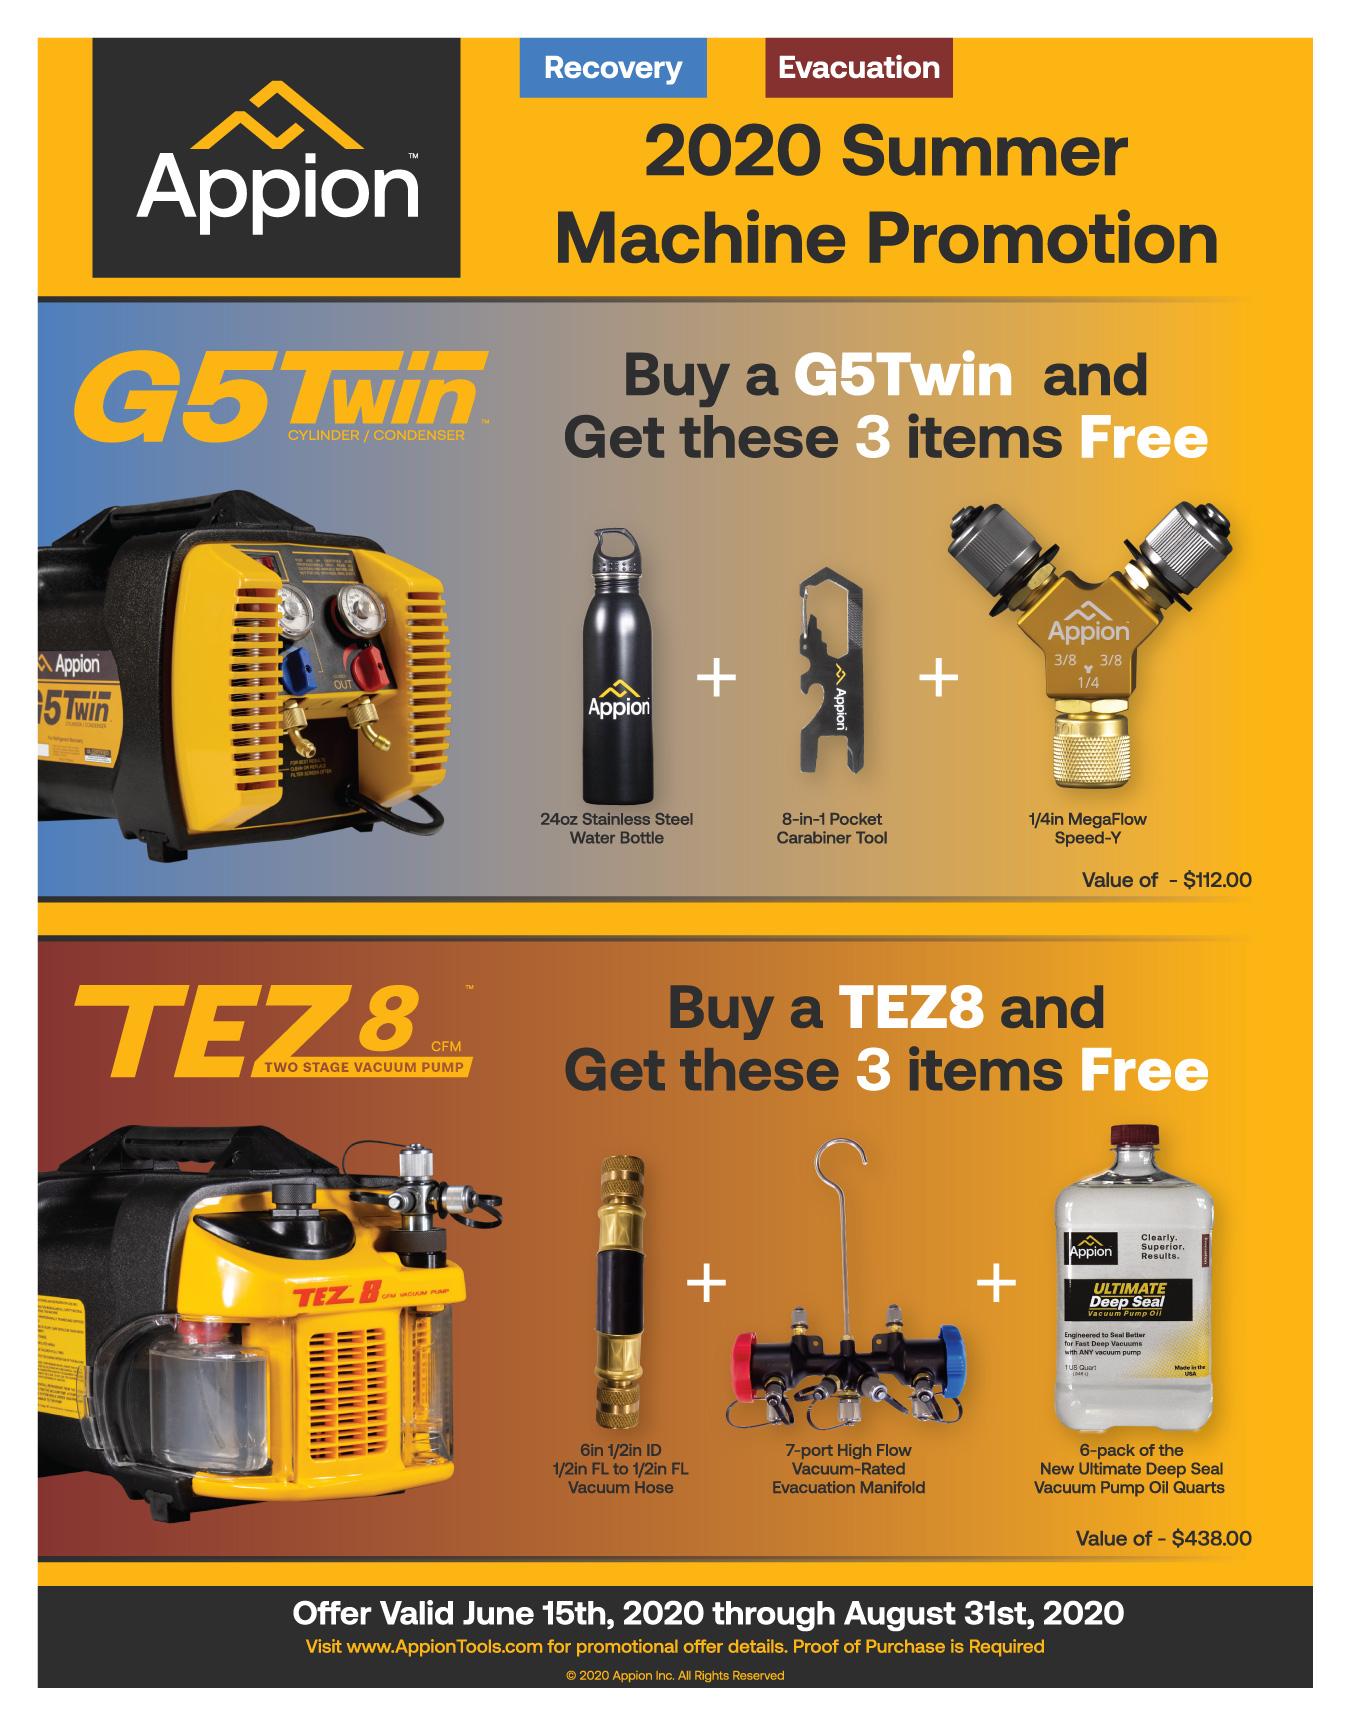 appion-2020-summer-machine-promo-outlines-01.jpg